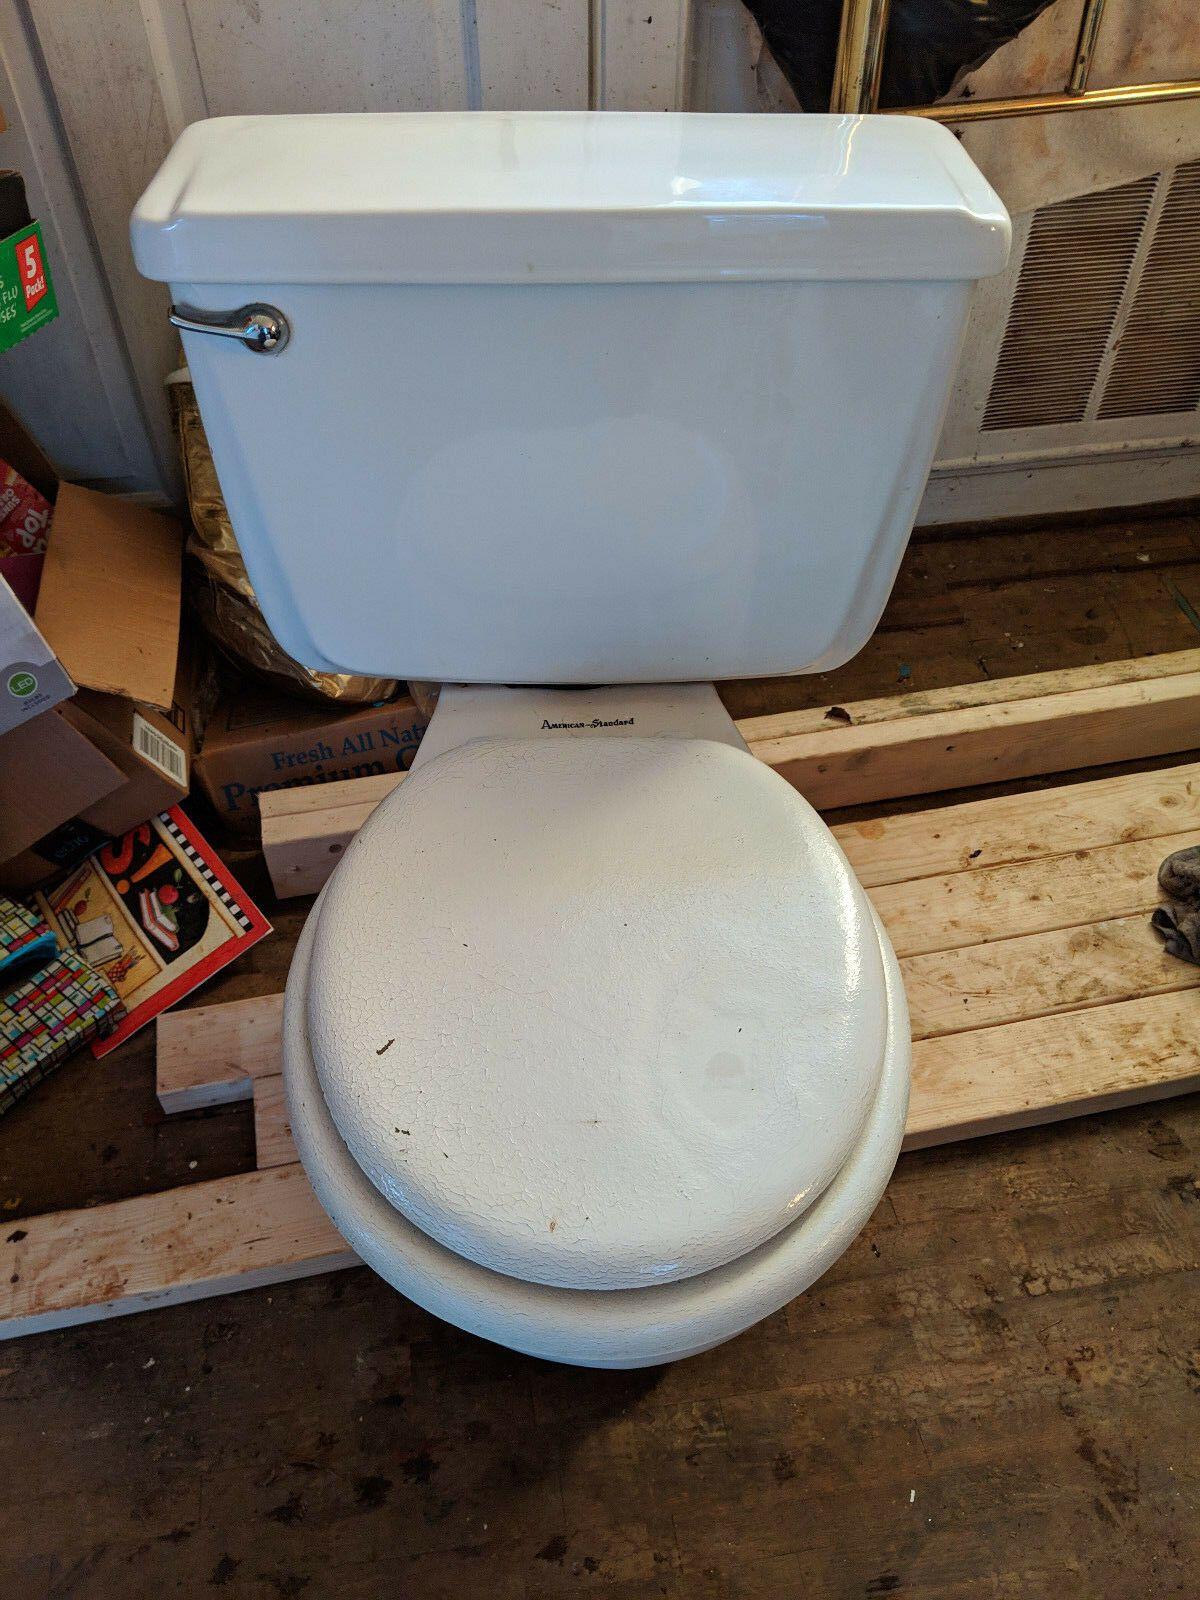 Https Ift Tt 2ycc1td Toilets Ideas Of Toilets Toilets Vintage Retro 1950s American Standard 4043 F4043 W Toto Toilet Home Depot Toilets Kohler Toilet